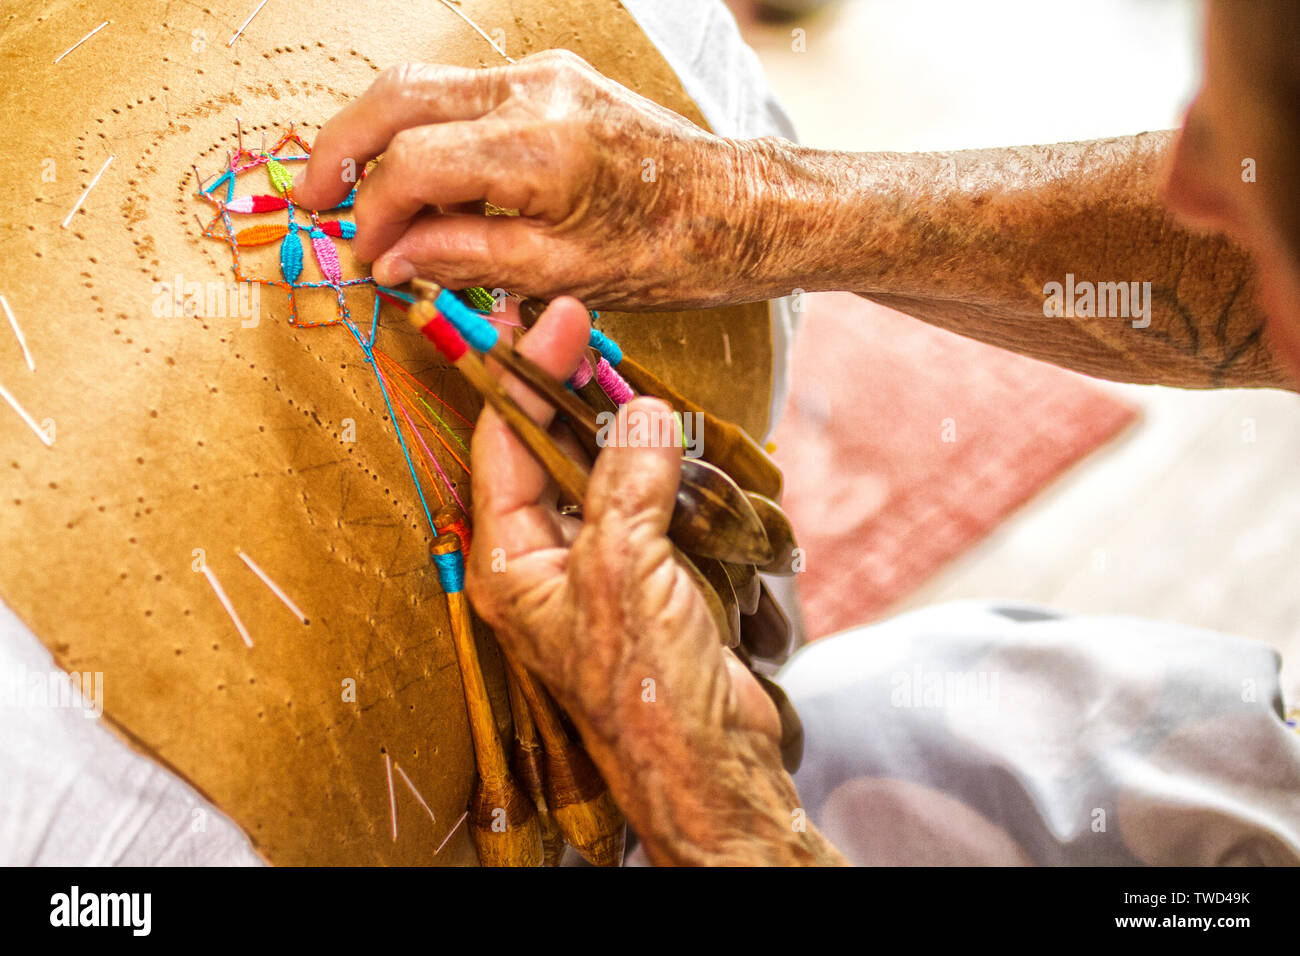 Hands of an artisan woman doing bobbin lace work in Sambaqui, at Santo Antonio de Lisboa district. Florianopolis, Santa Catarina, Brazil. - Stock Image